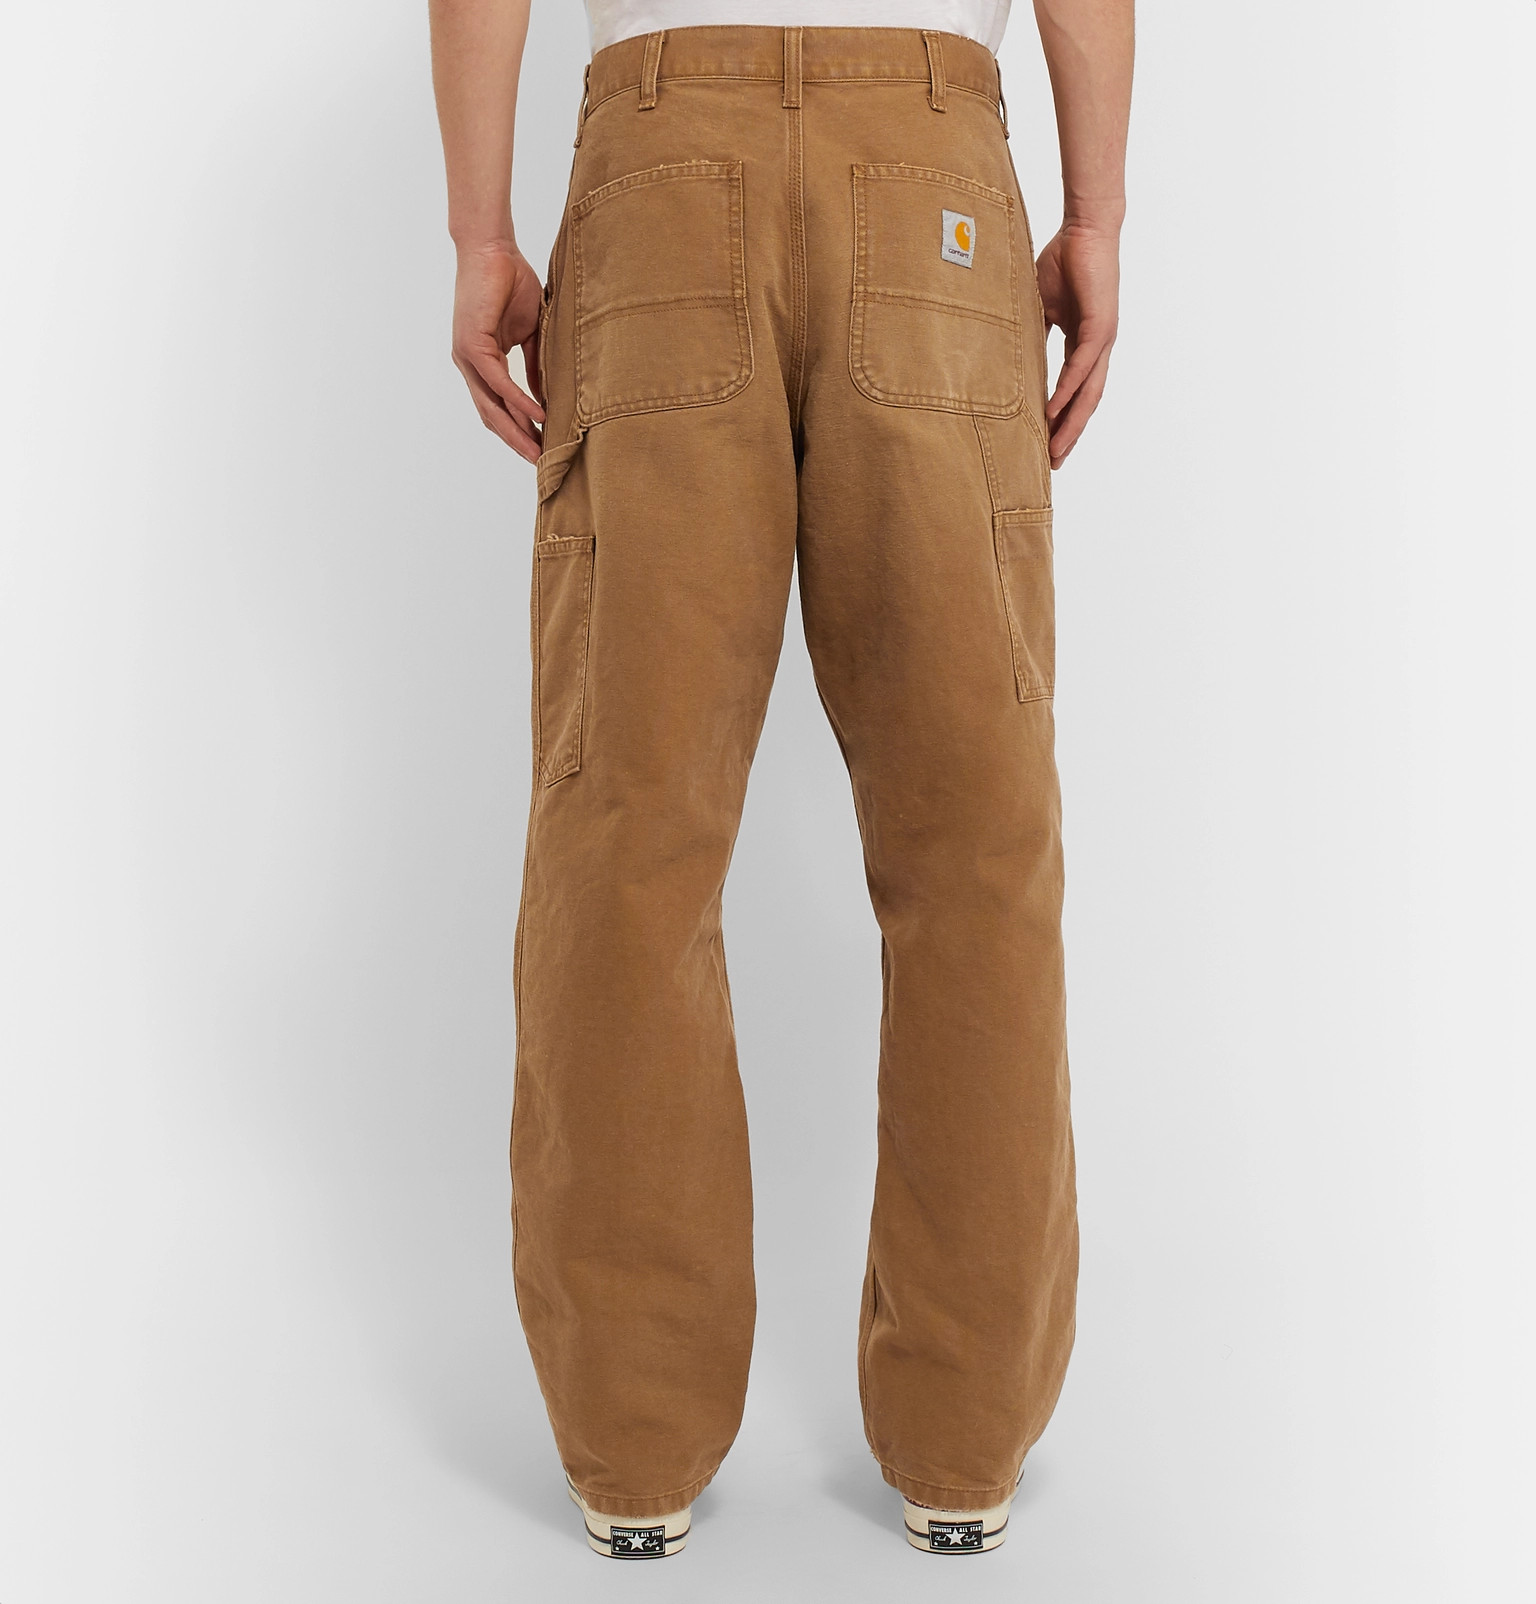 6c83821c5cc Carhartt WIP - Single Knee Wide-Leg Cotton-Canvas Trousers